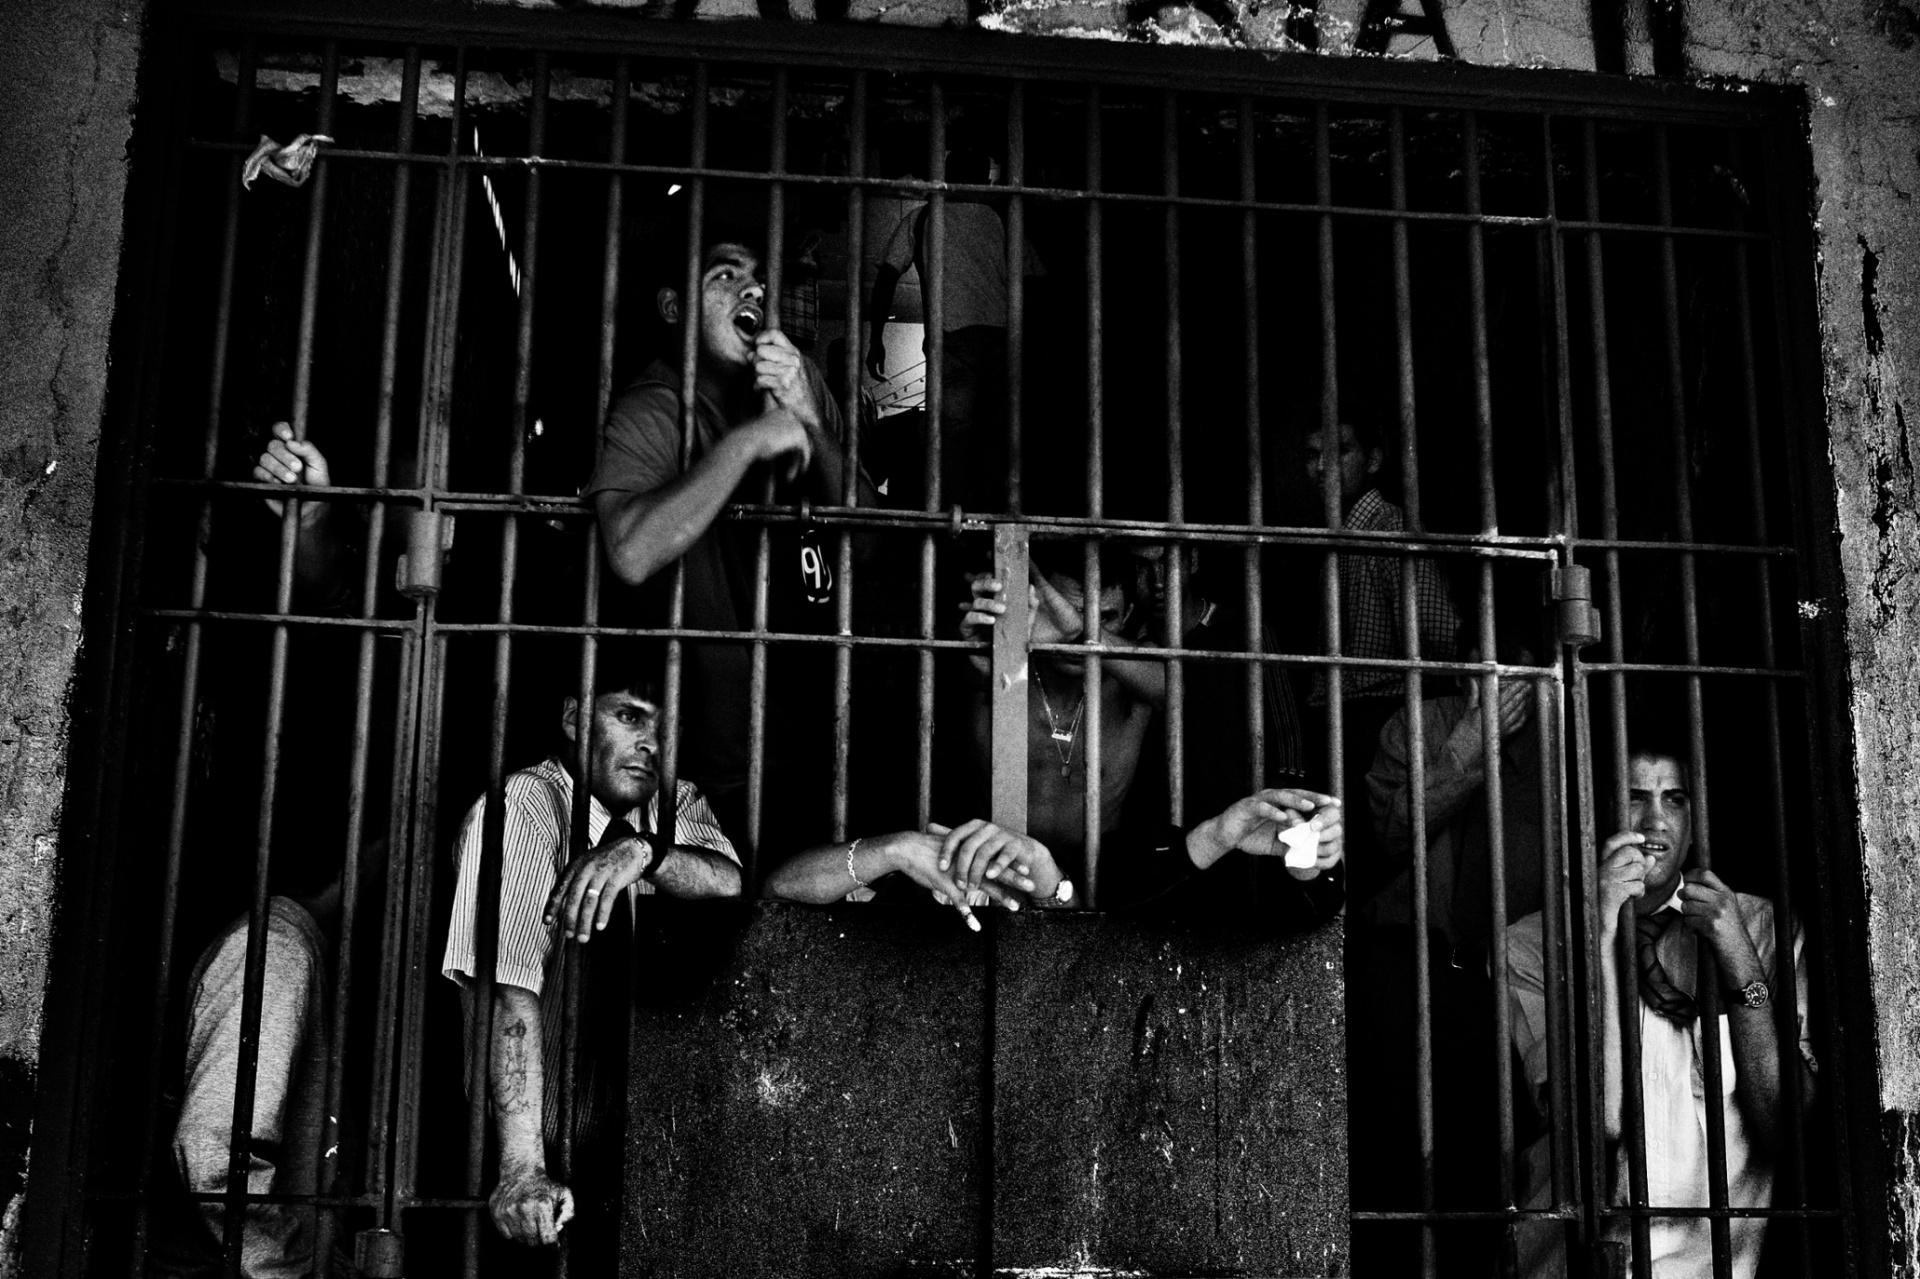 fotograf Valerio Bispuri 9